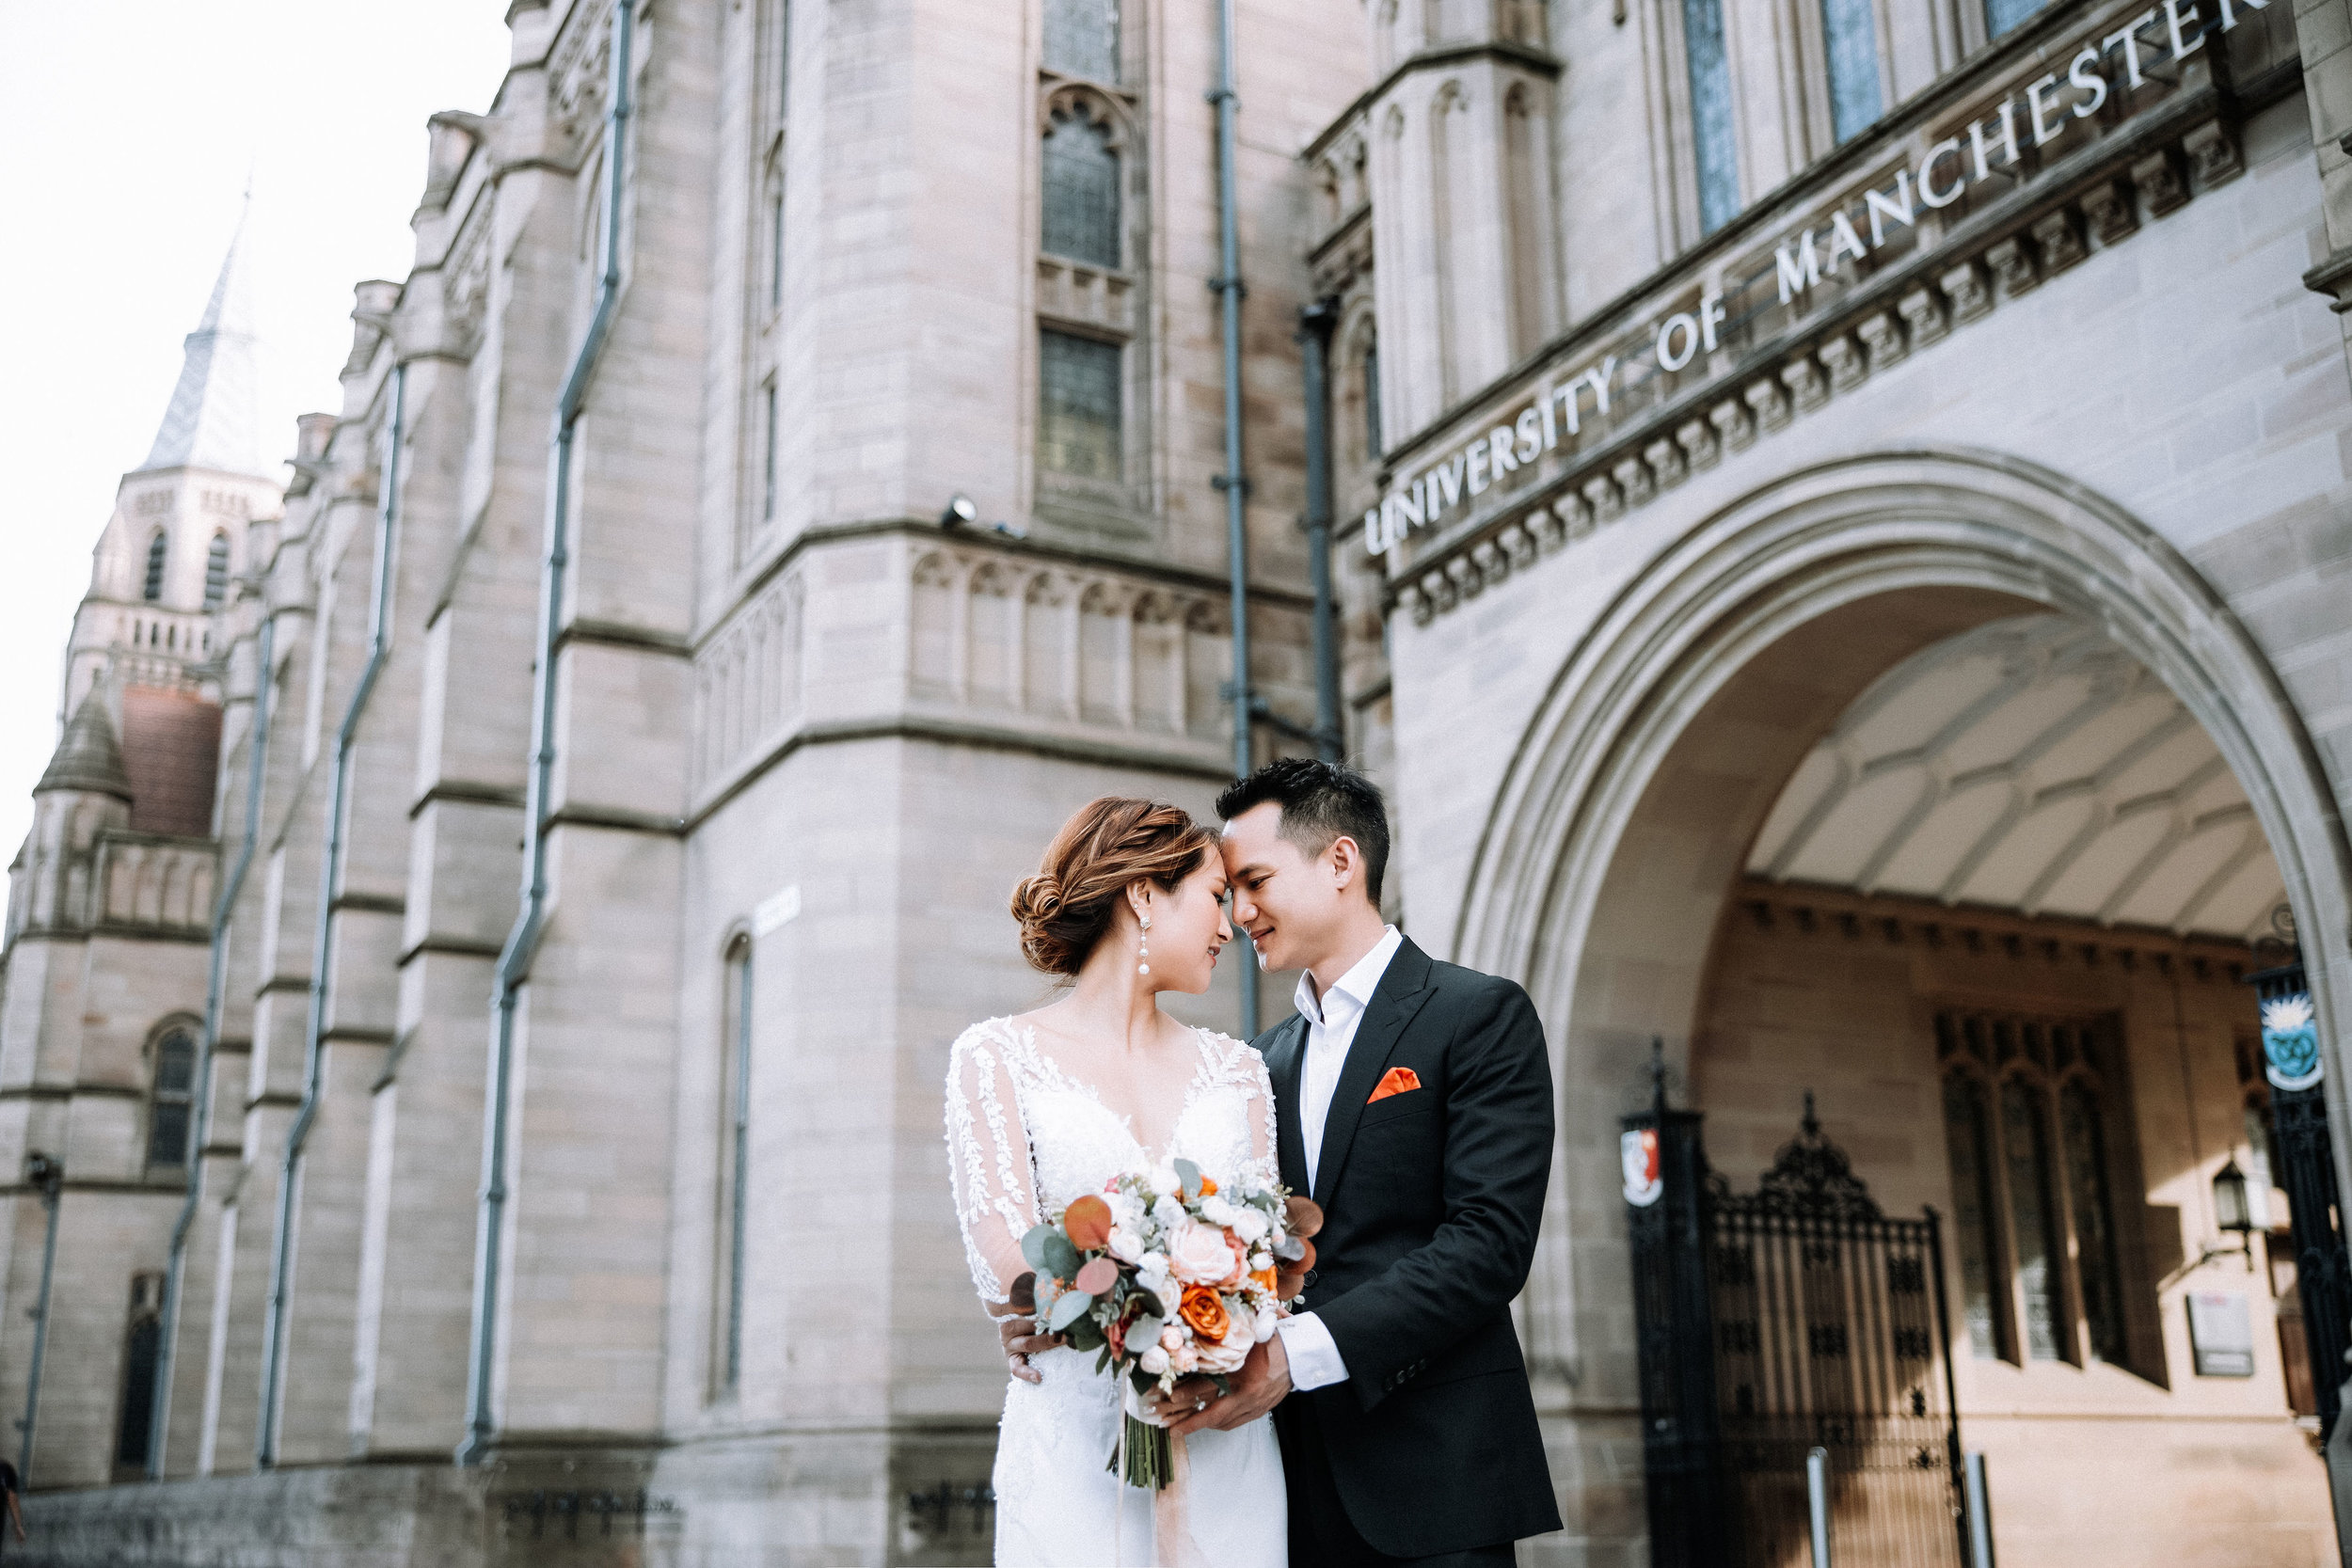 bride+groom+bespoke+lace+long+sleeve+wedding+dress+ccm.jpg